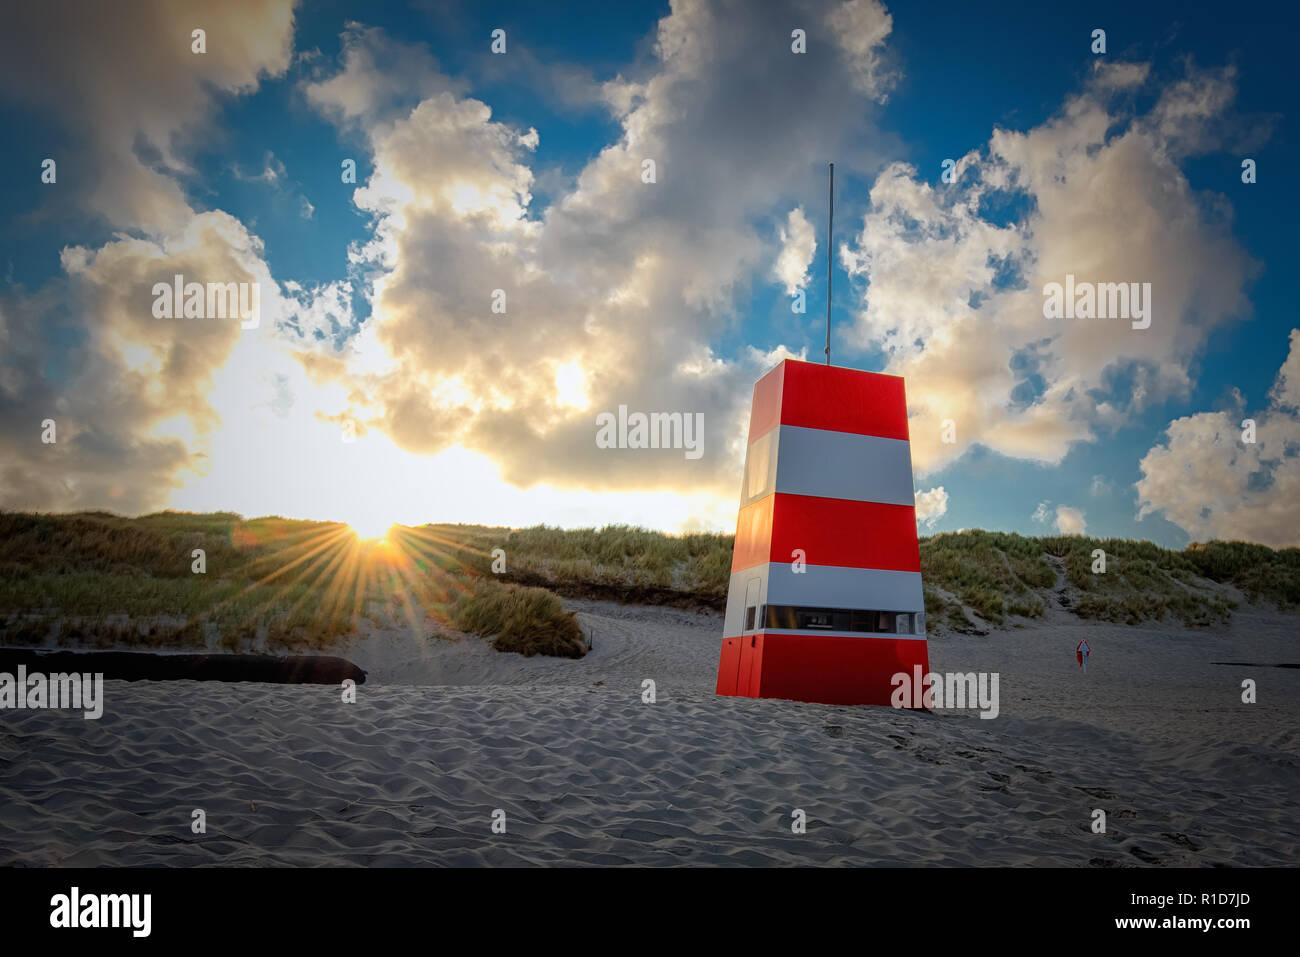 Retuungsturm am Strand von Hvide Sande - Stock Image